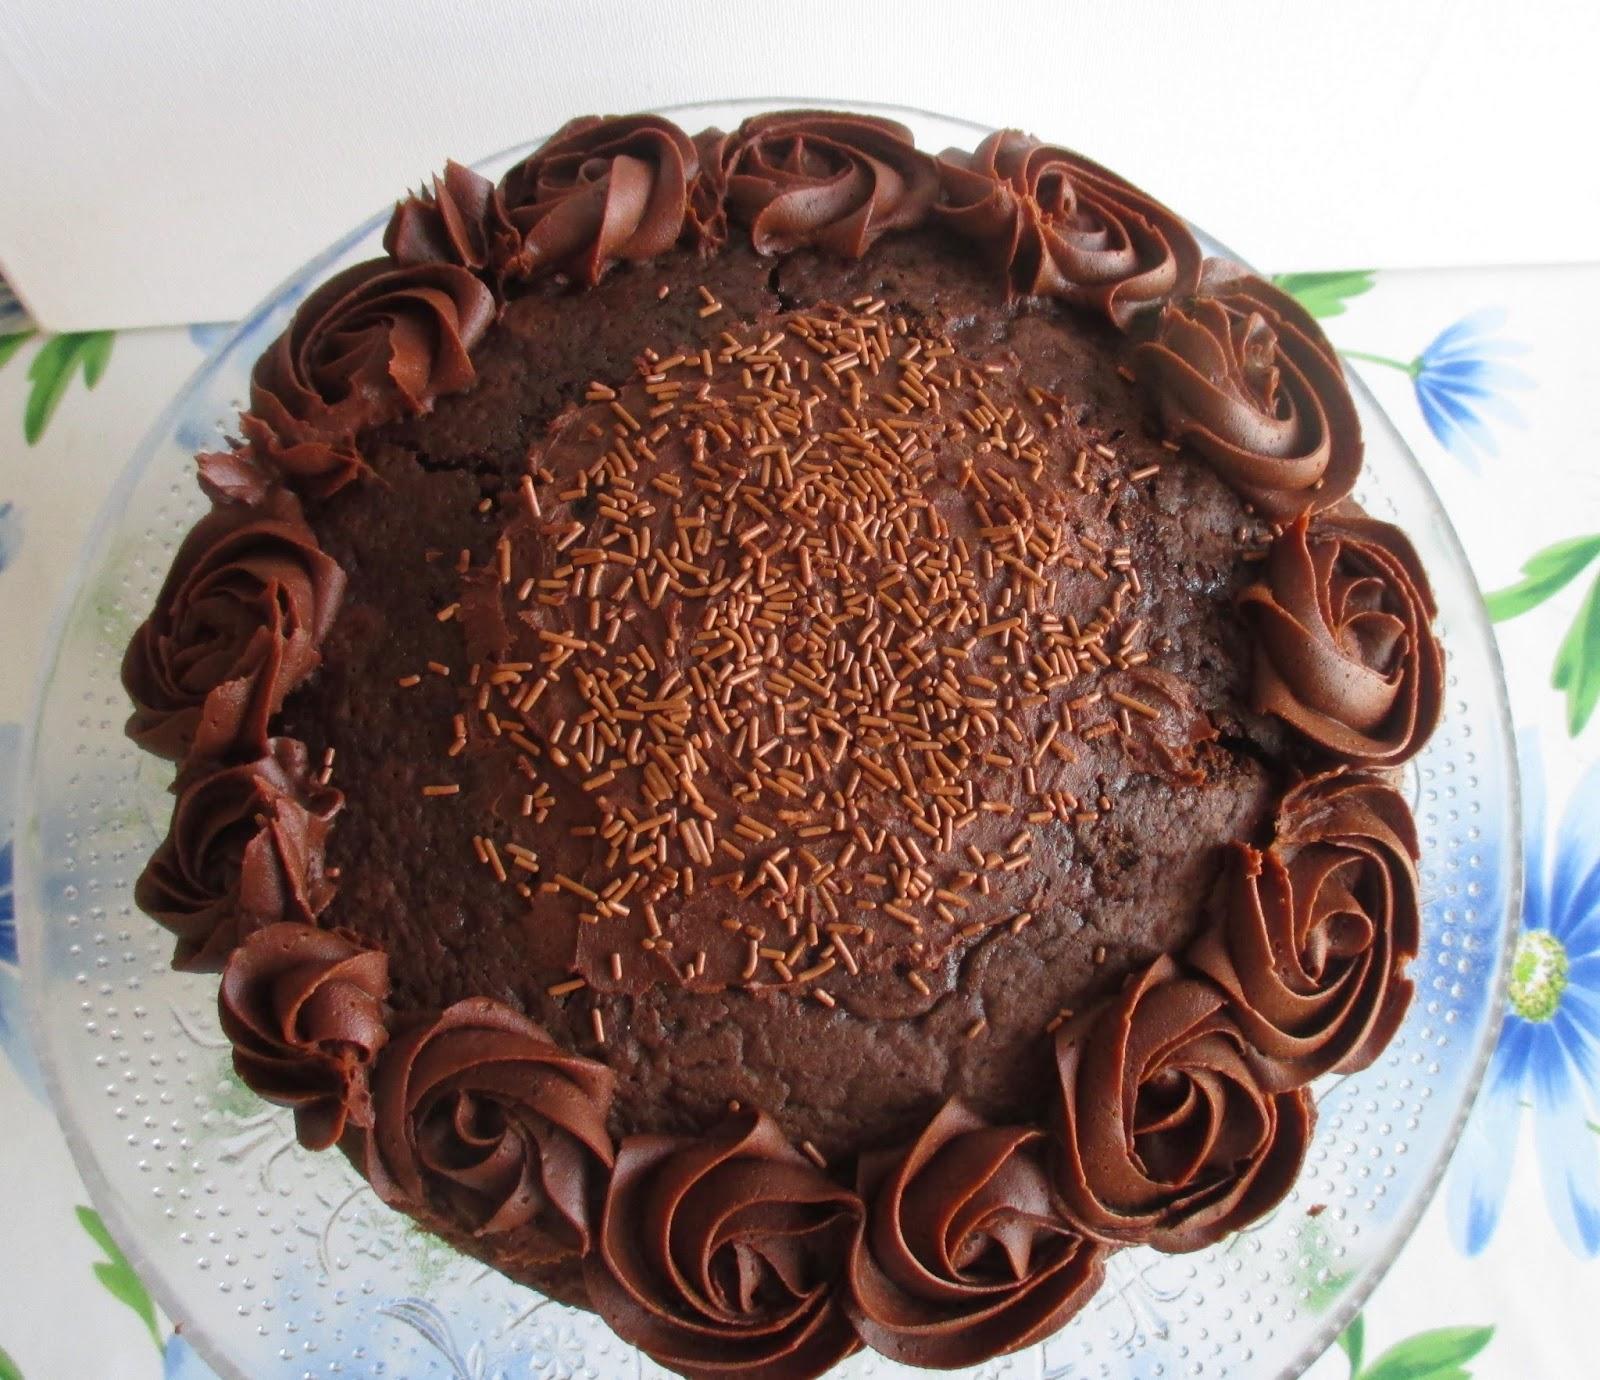 My Cupcake Habit A Yummy Pretty Chocolate Cake